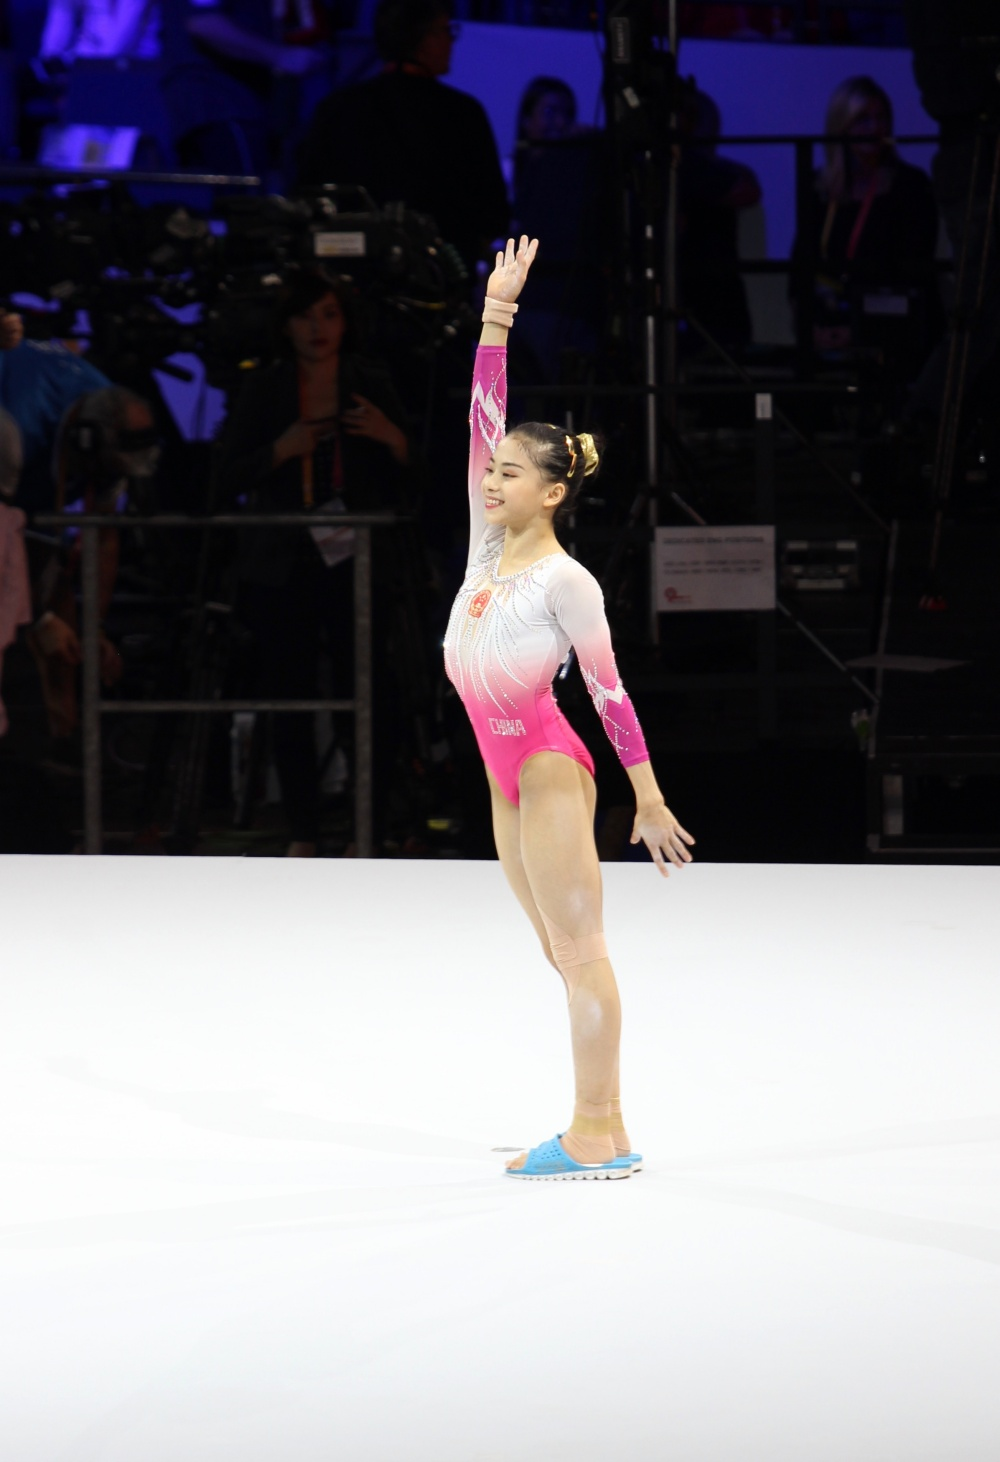 Li Shijia